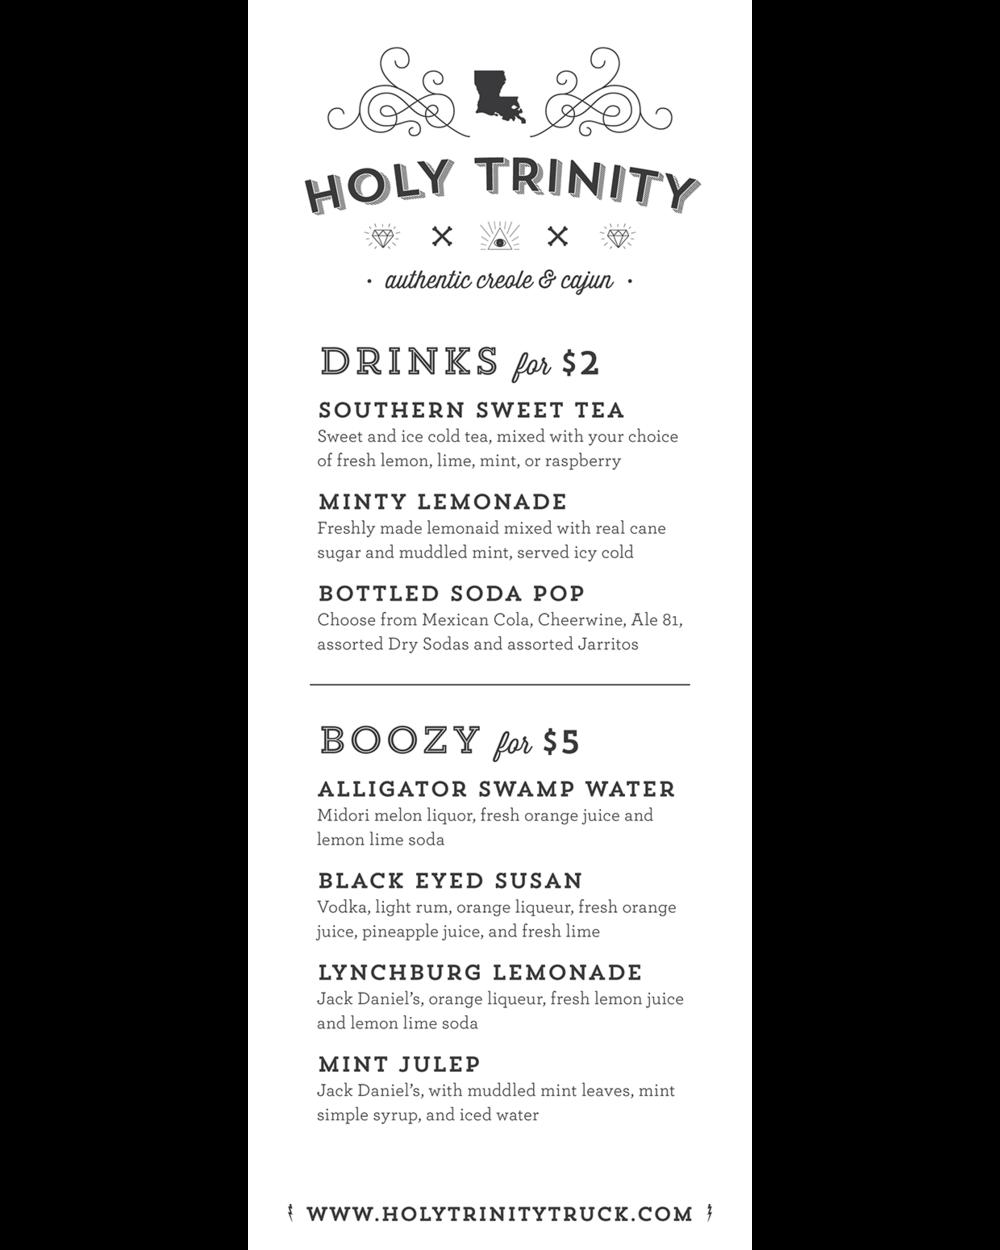 HolyTrinity_7.png